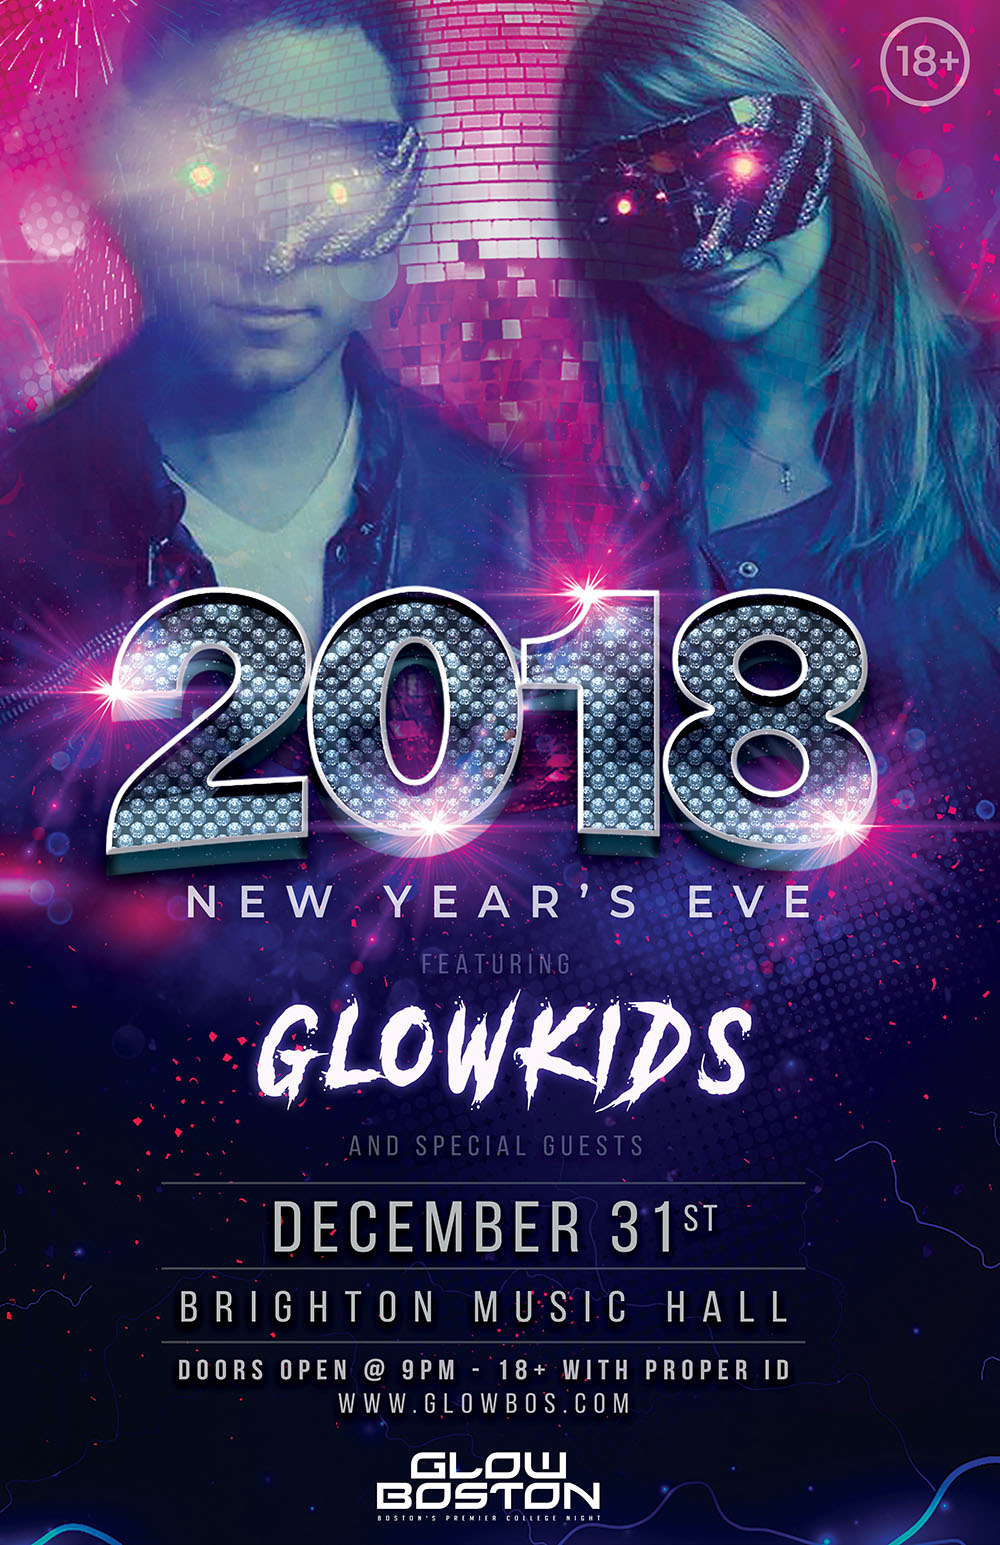 Glow Boston New Year's Eve 2018 12/31/17